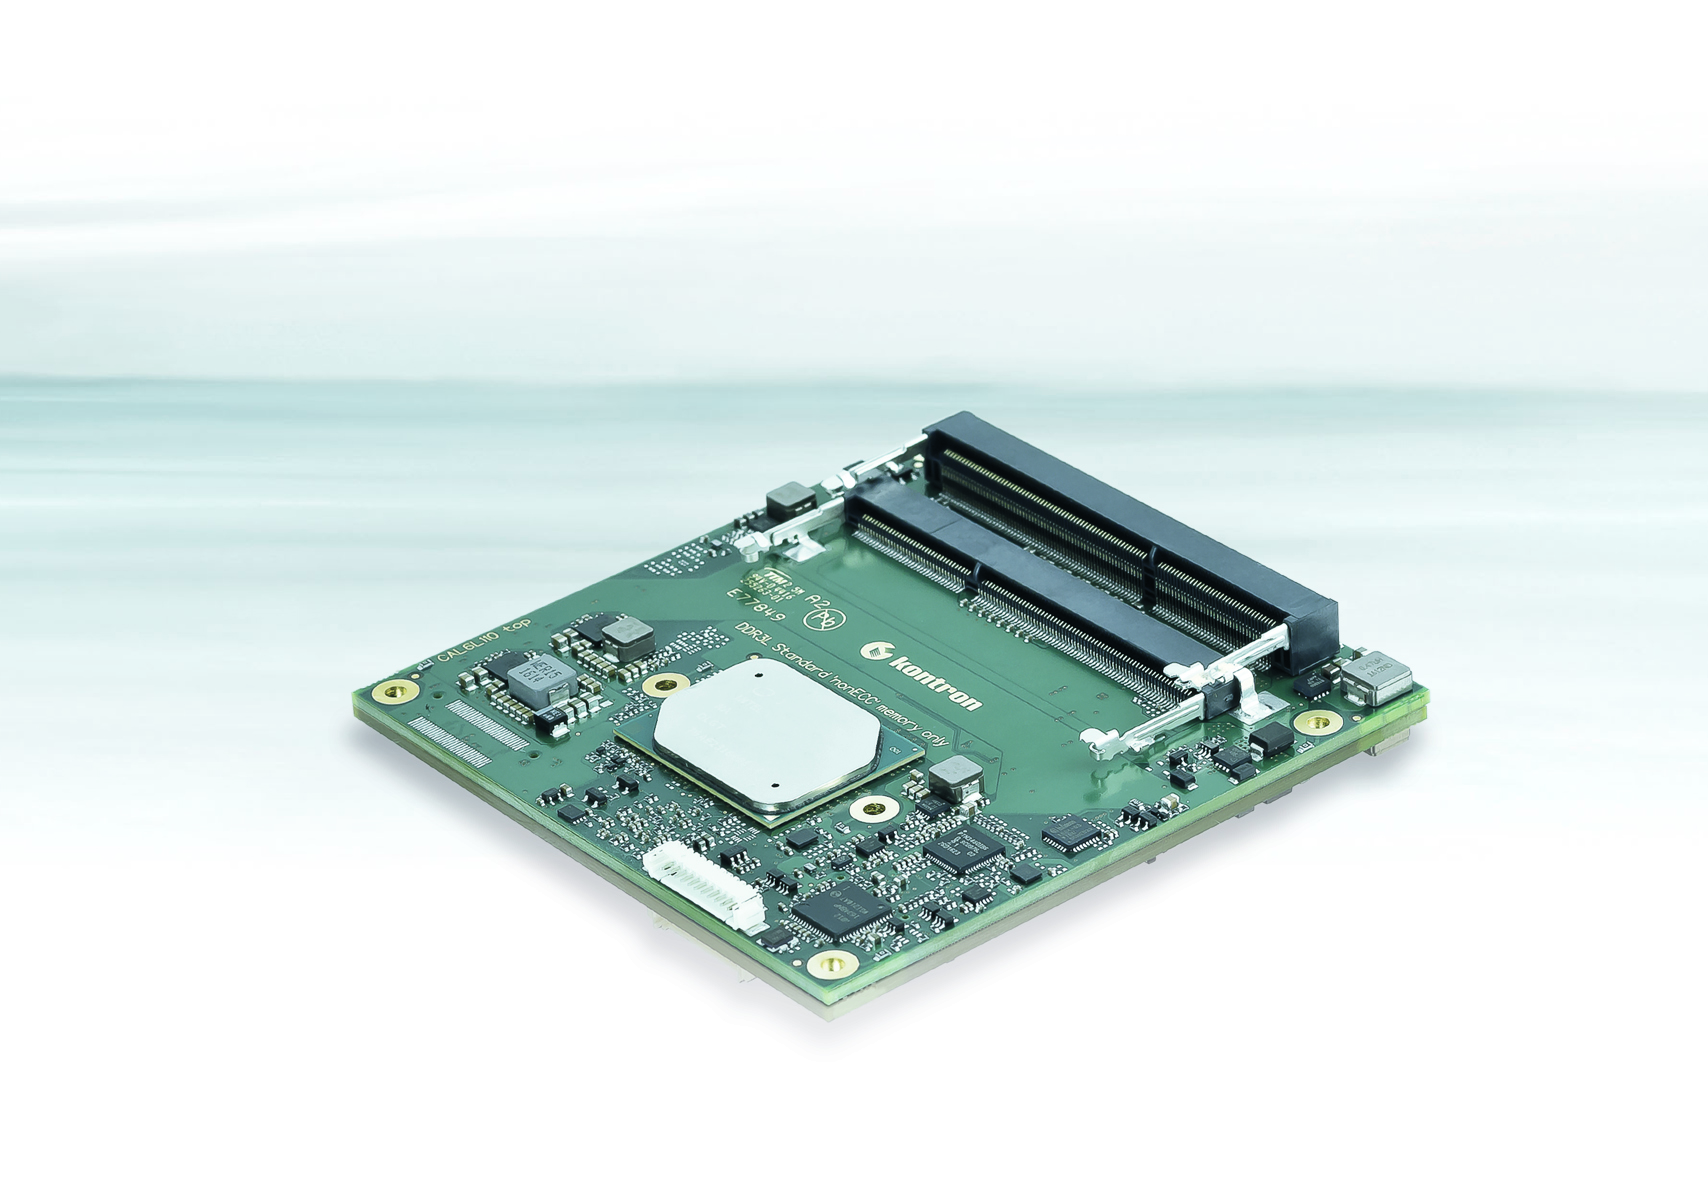 Kontron: neues COM-Express Compact Computer-on-Module COMe-cAL6 jetzt bei Aaronn